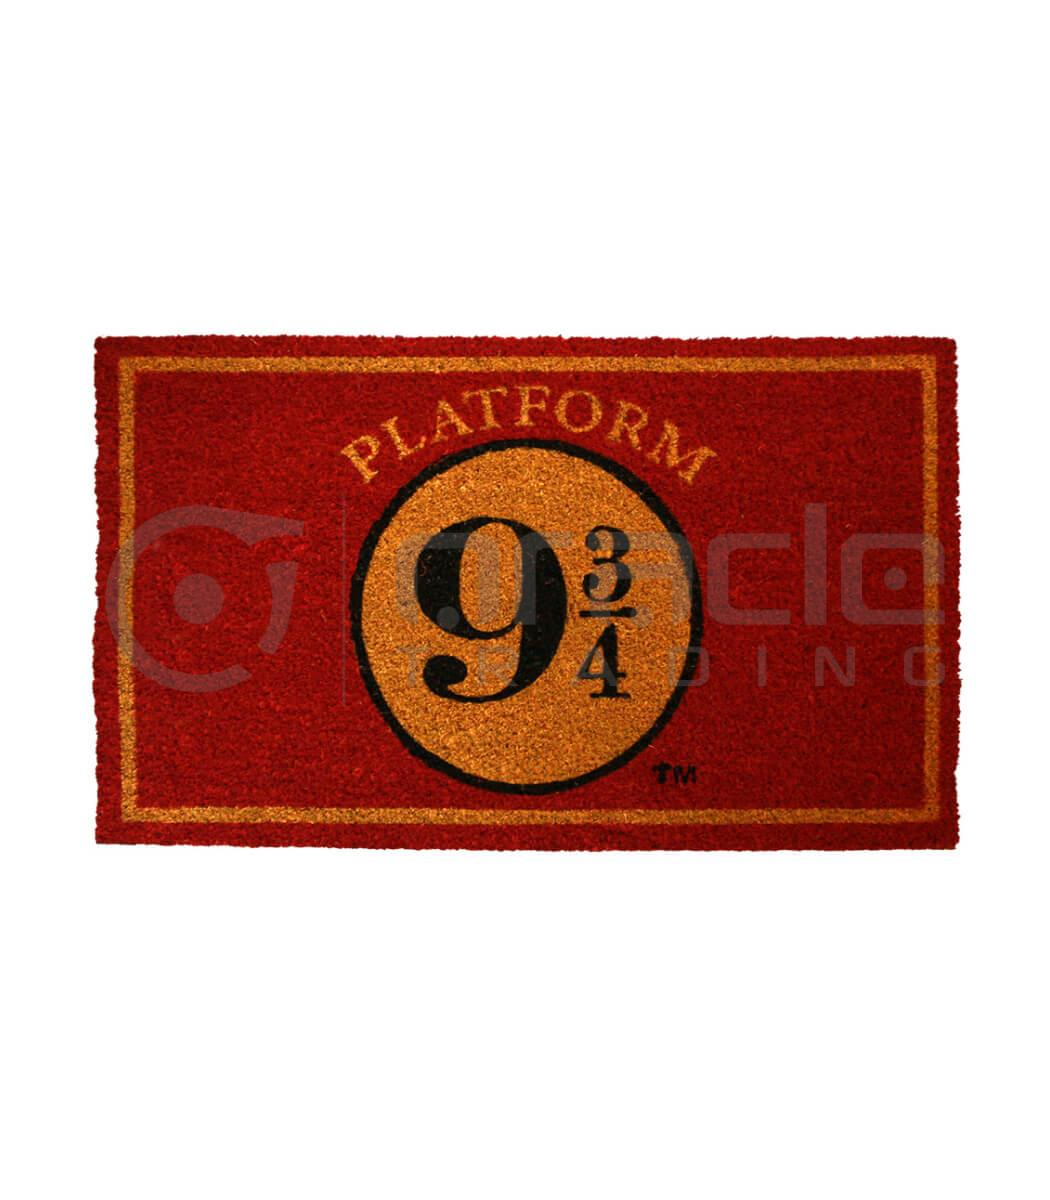 Harry Potter Doormat - Hogwarts Express